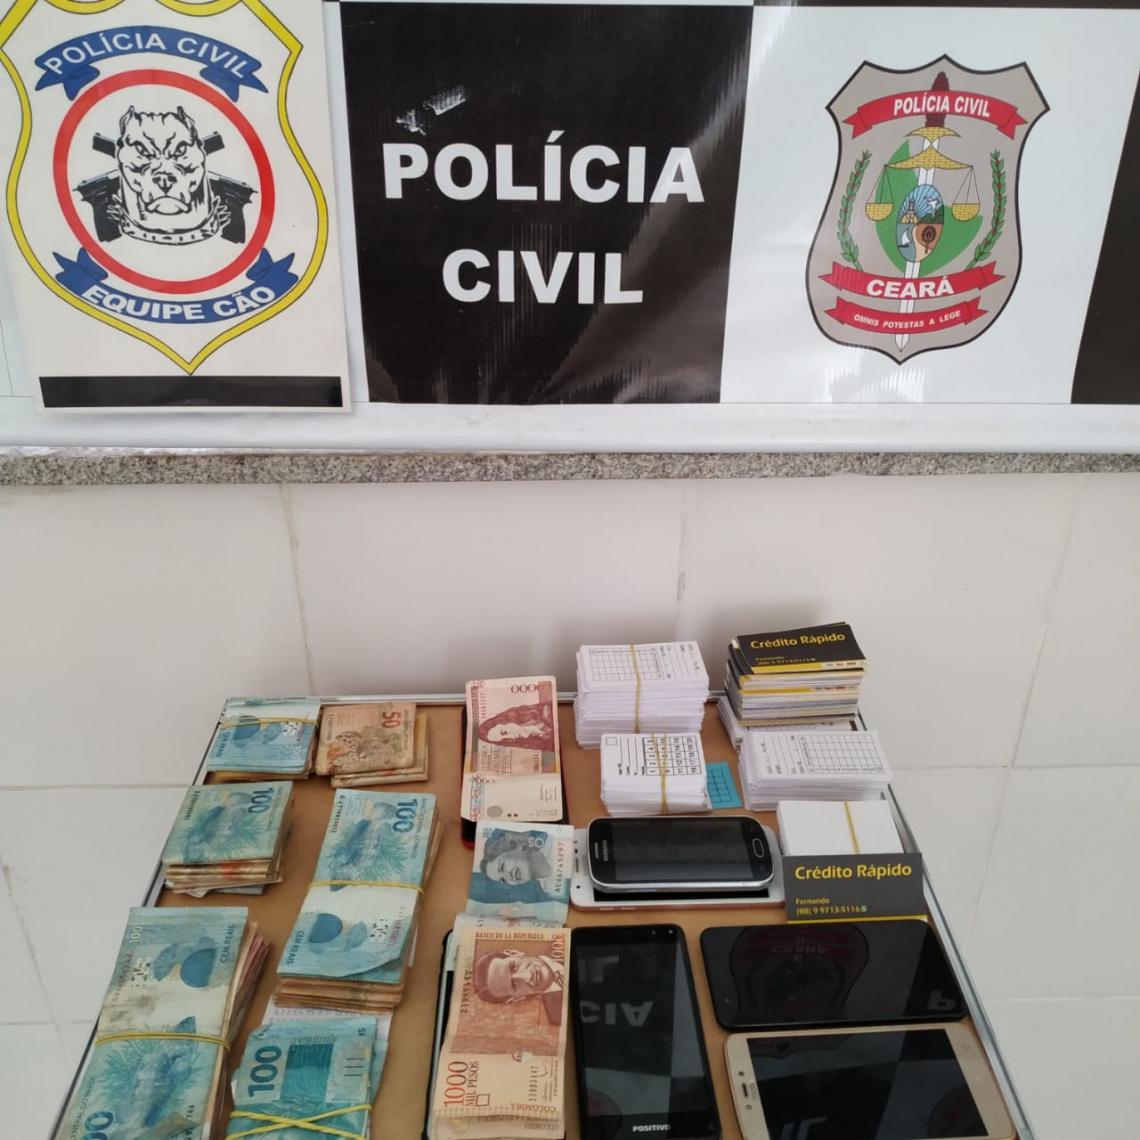 Polícia apreendeu R$11 mil; além de 17 mil pesos colombianos